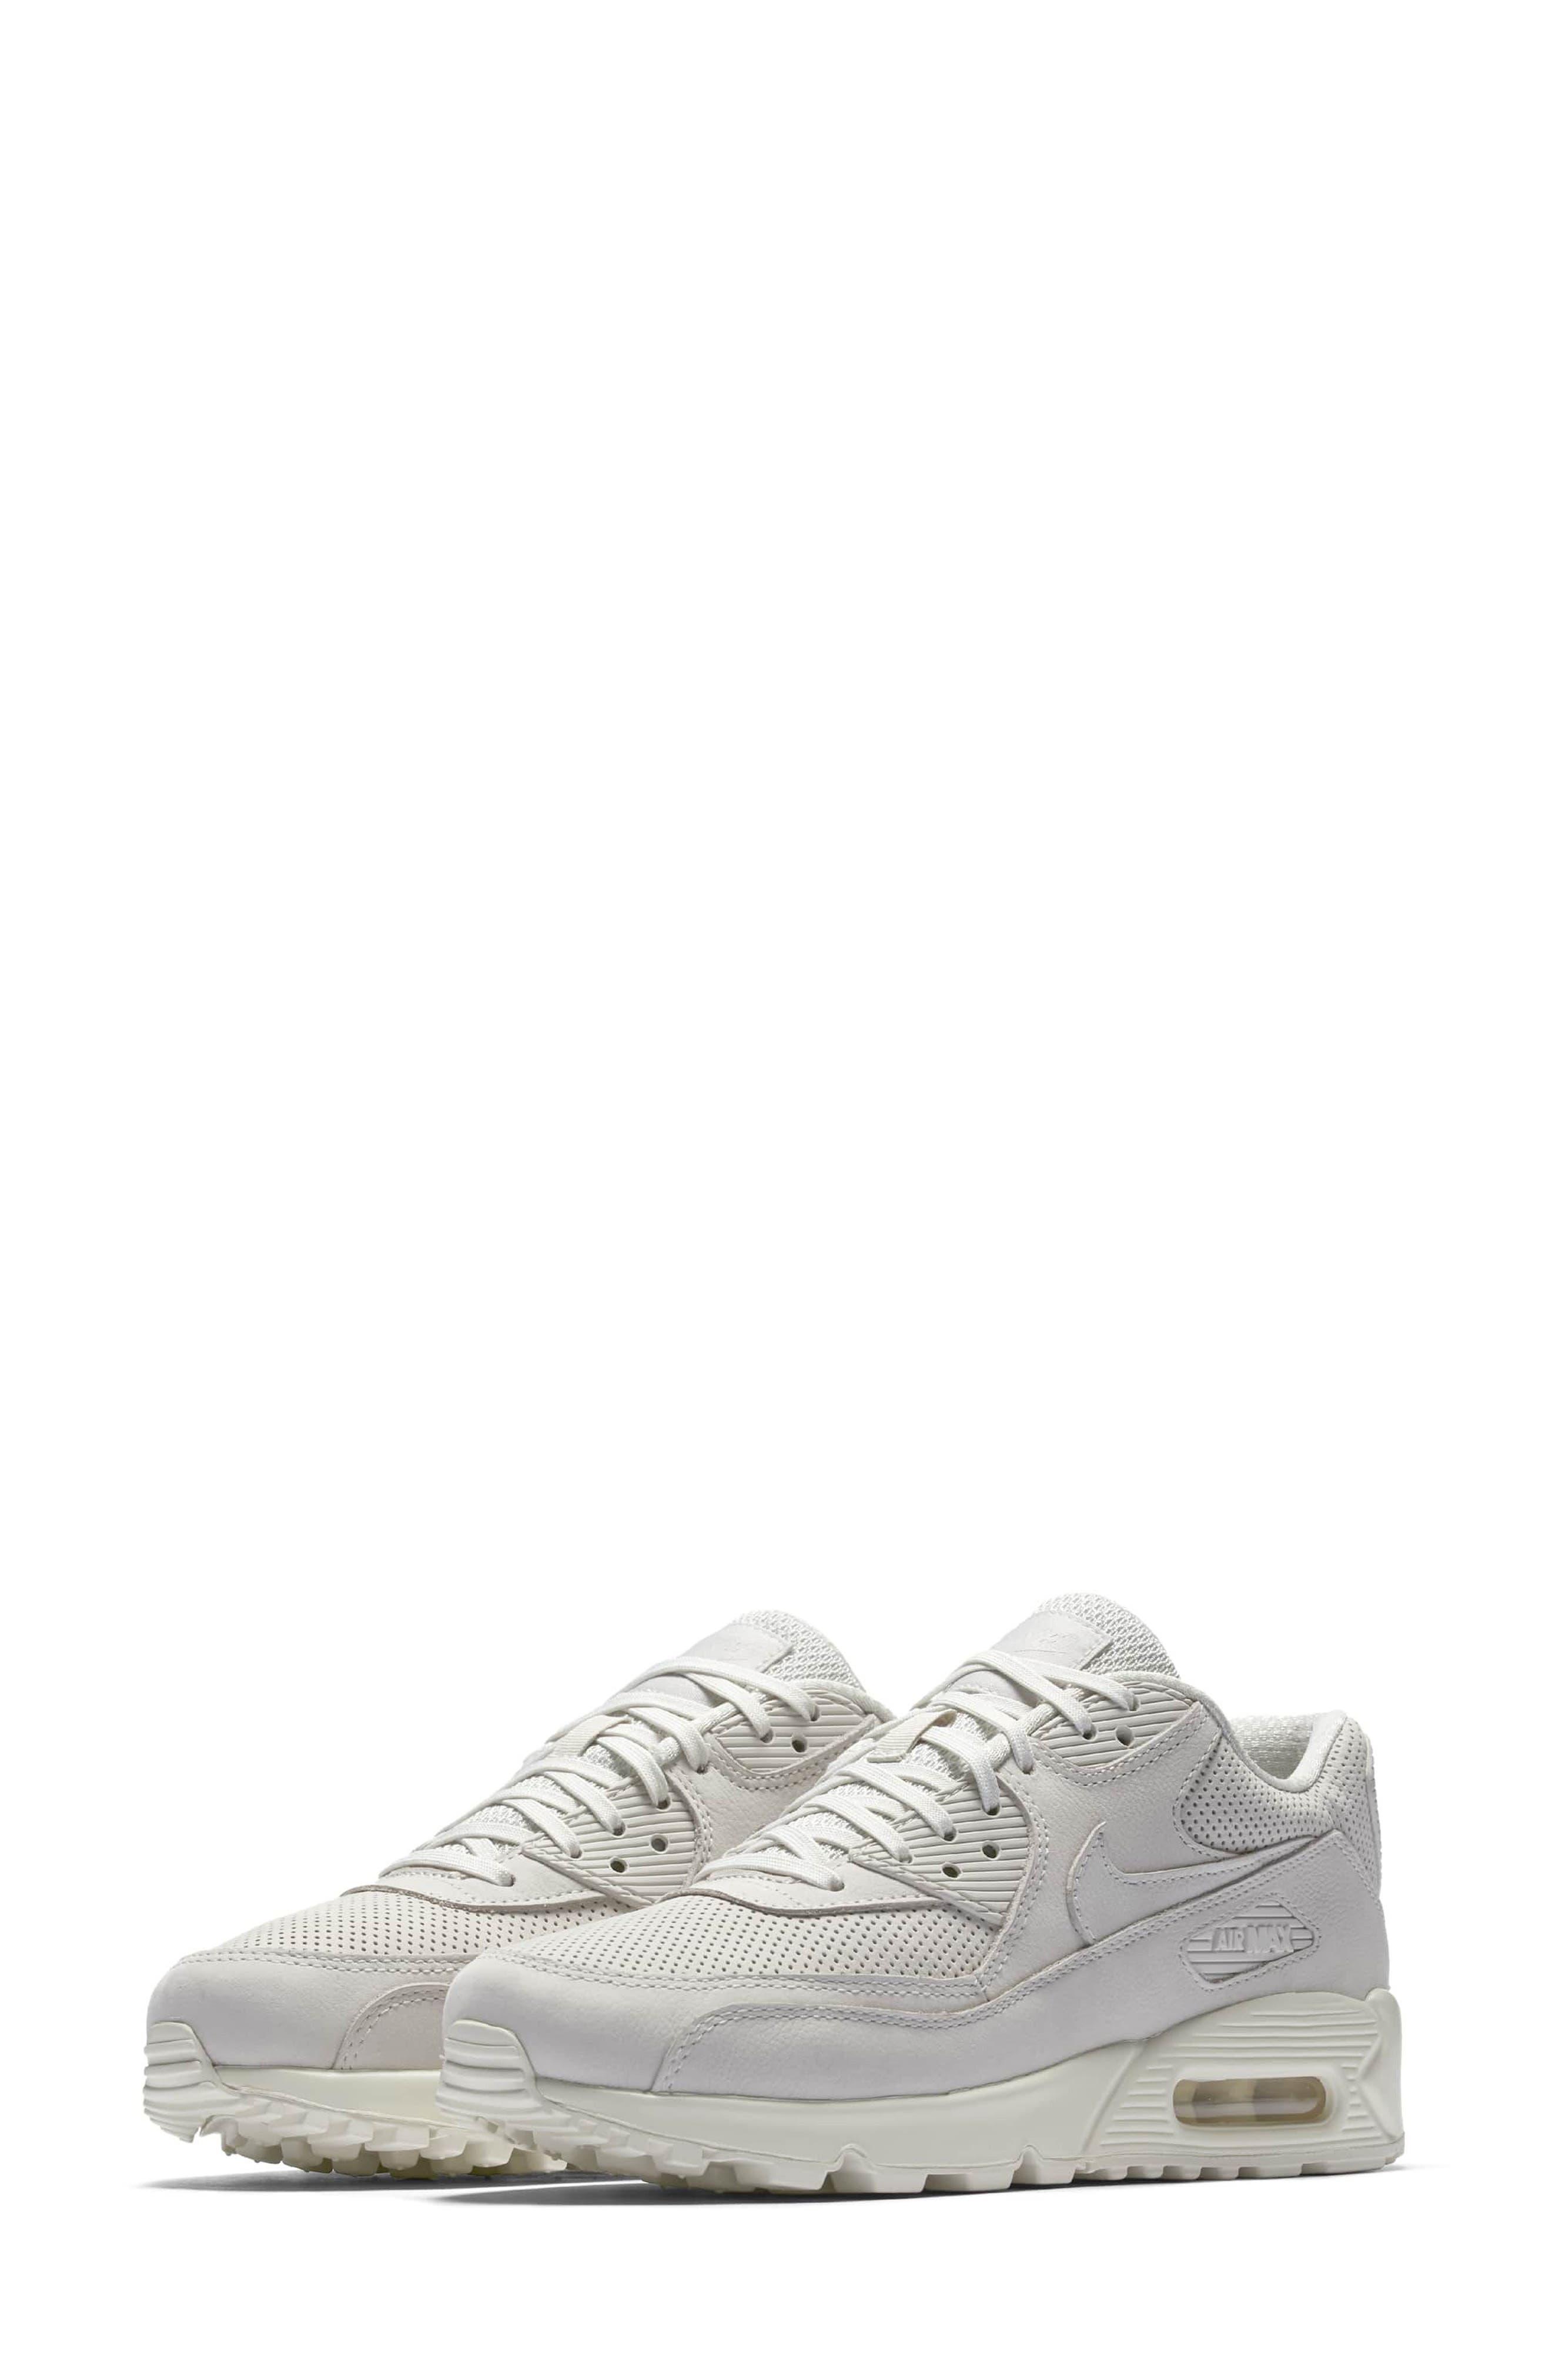 Nike Air Max 90 Pinnacle Sneaker (Women's)